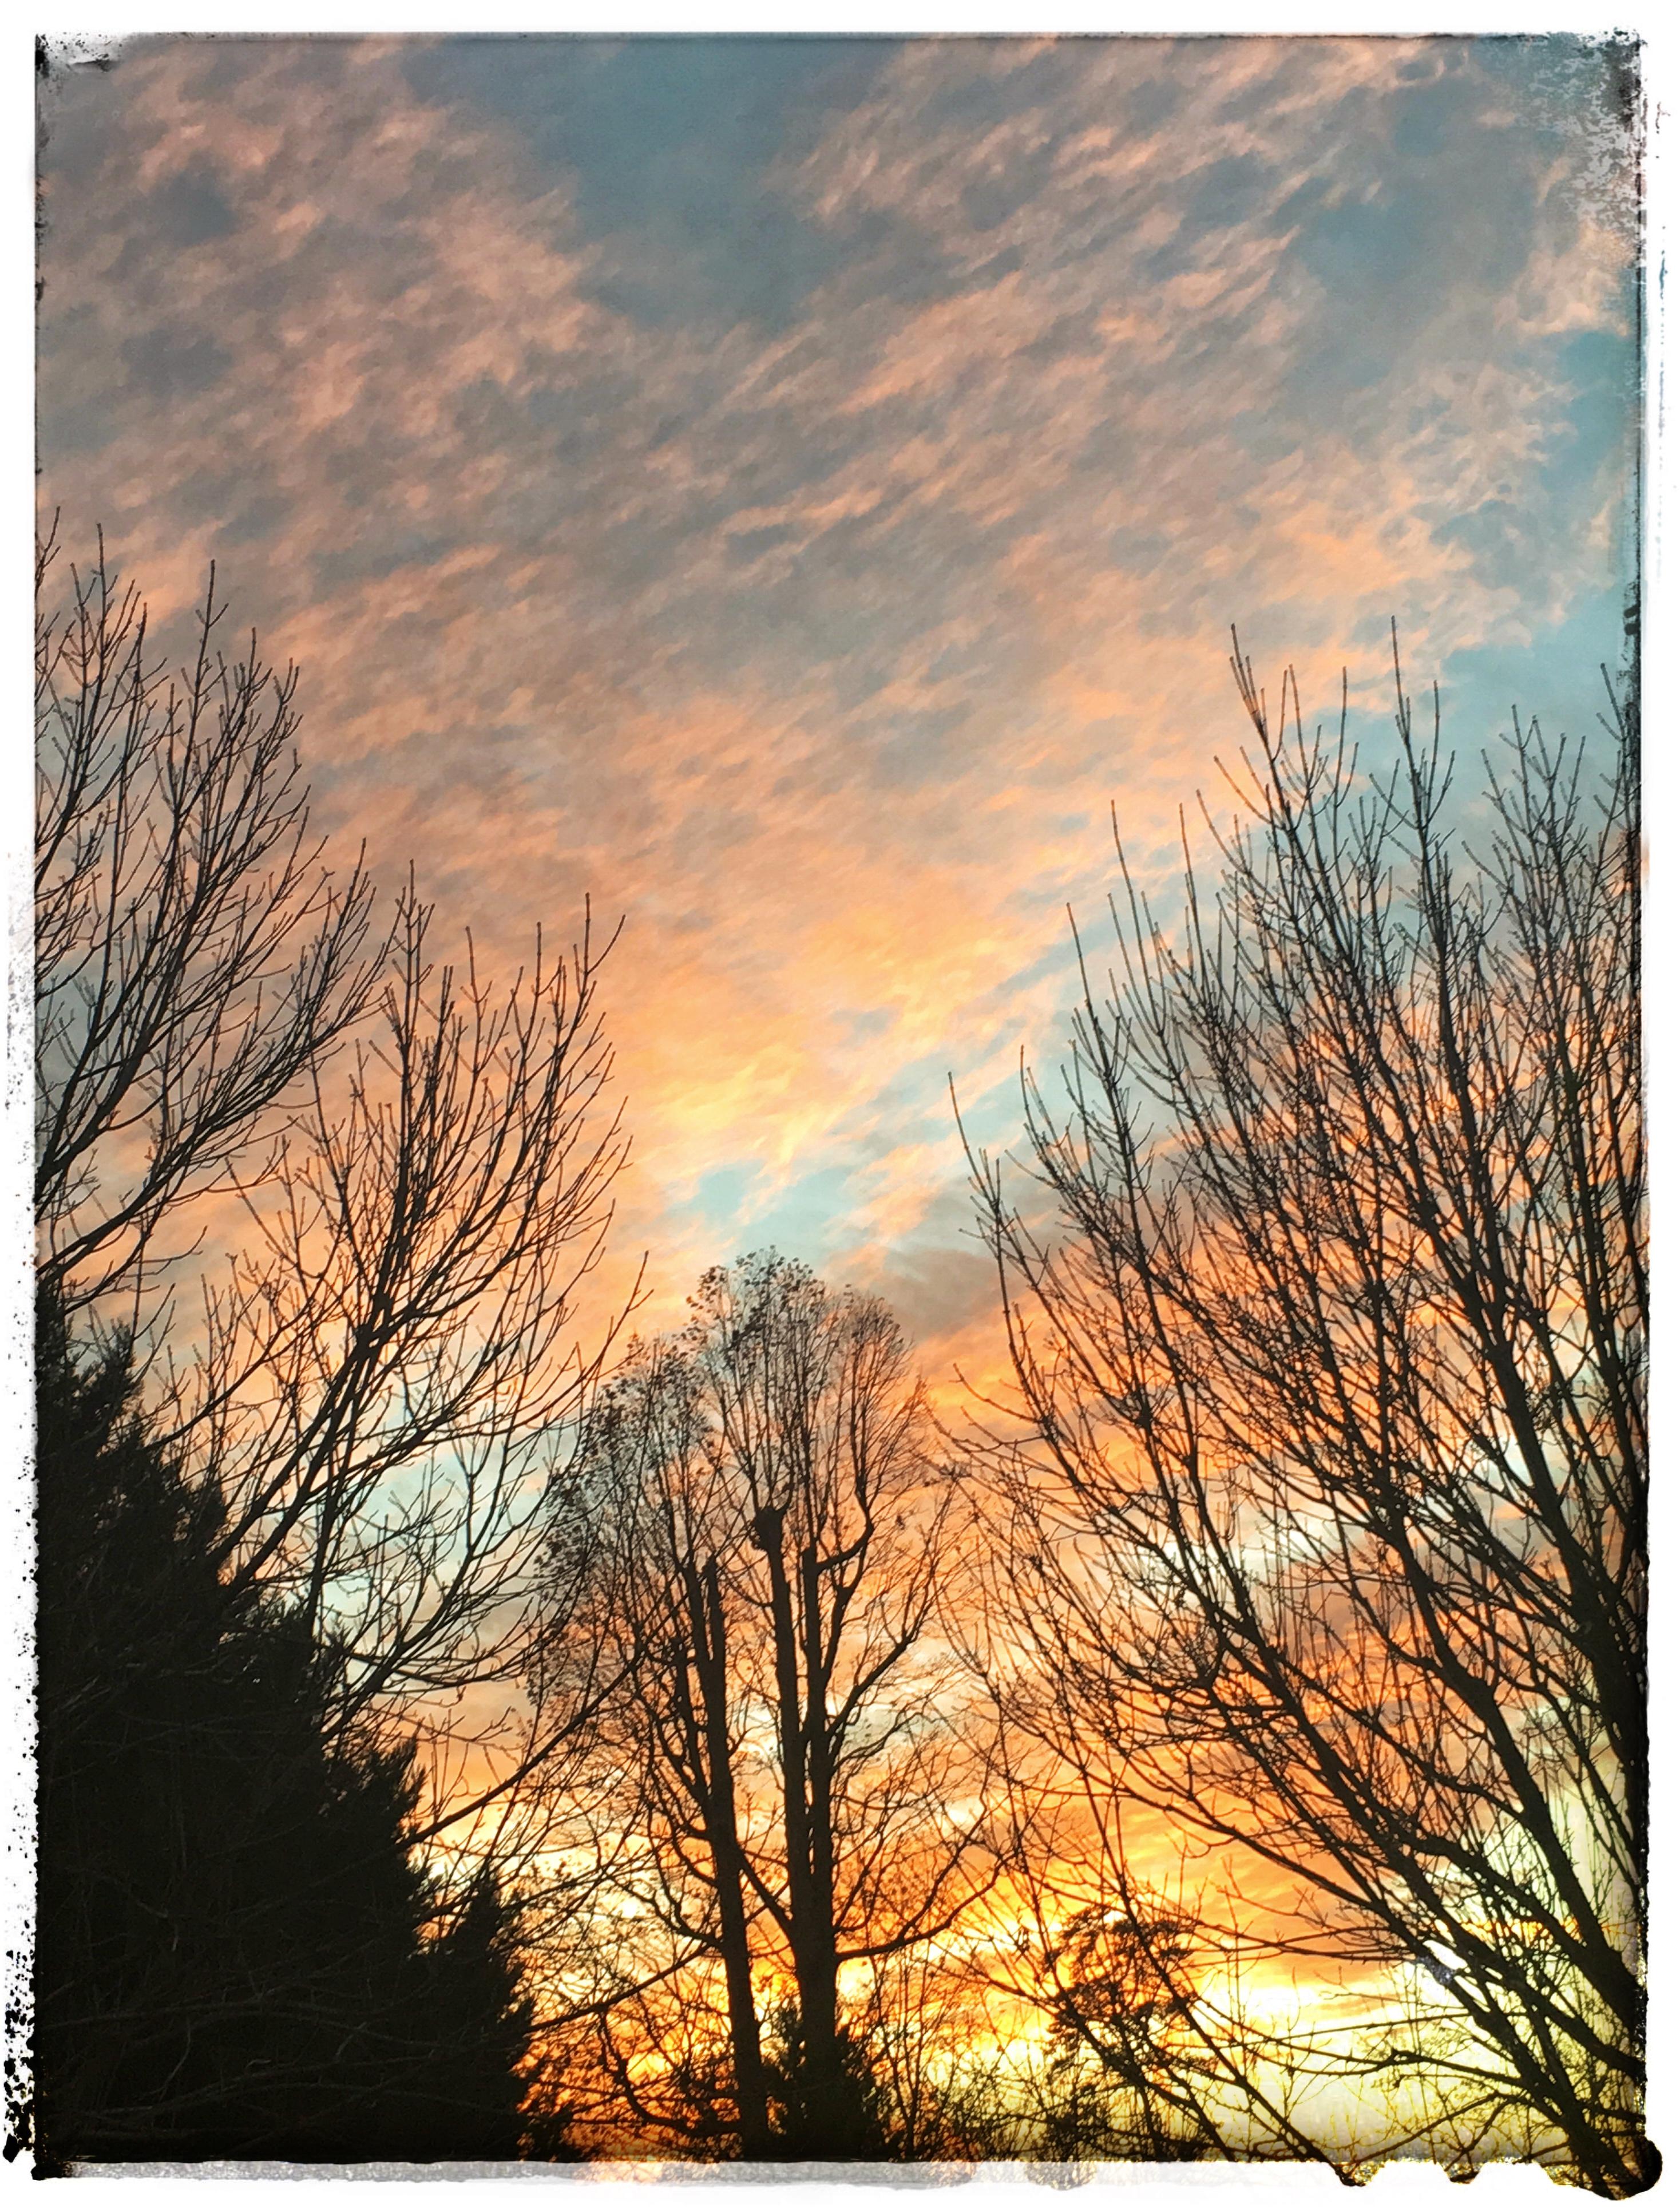 Trees & Sunset hirez.jpg